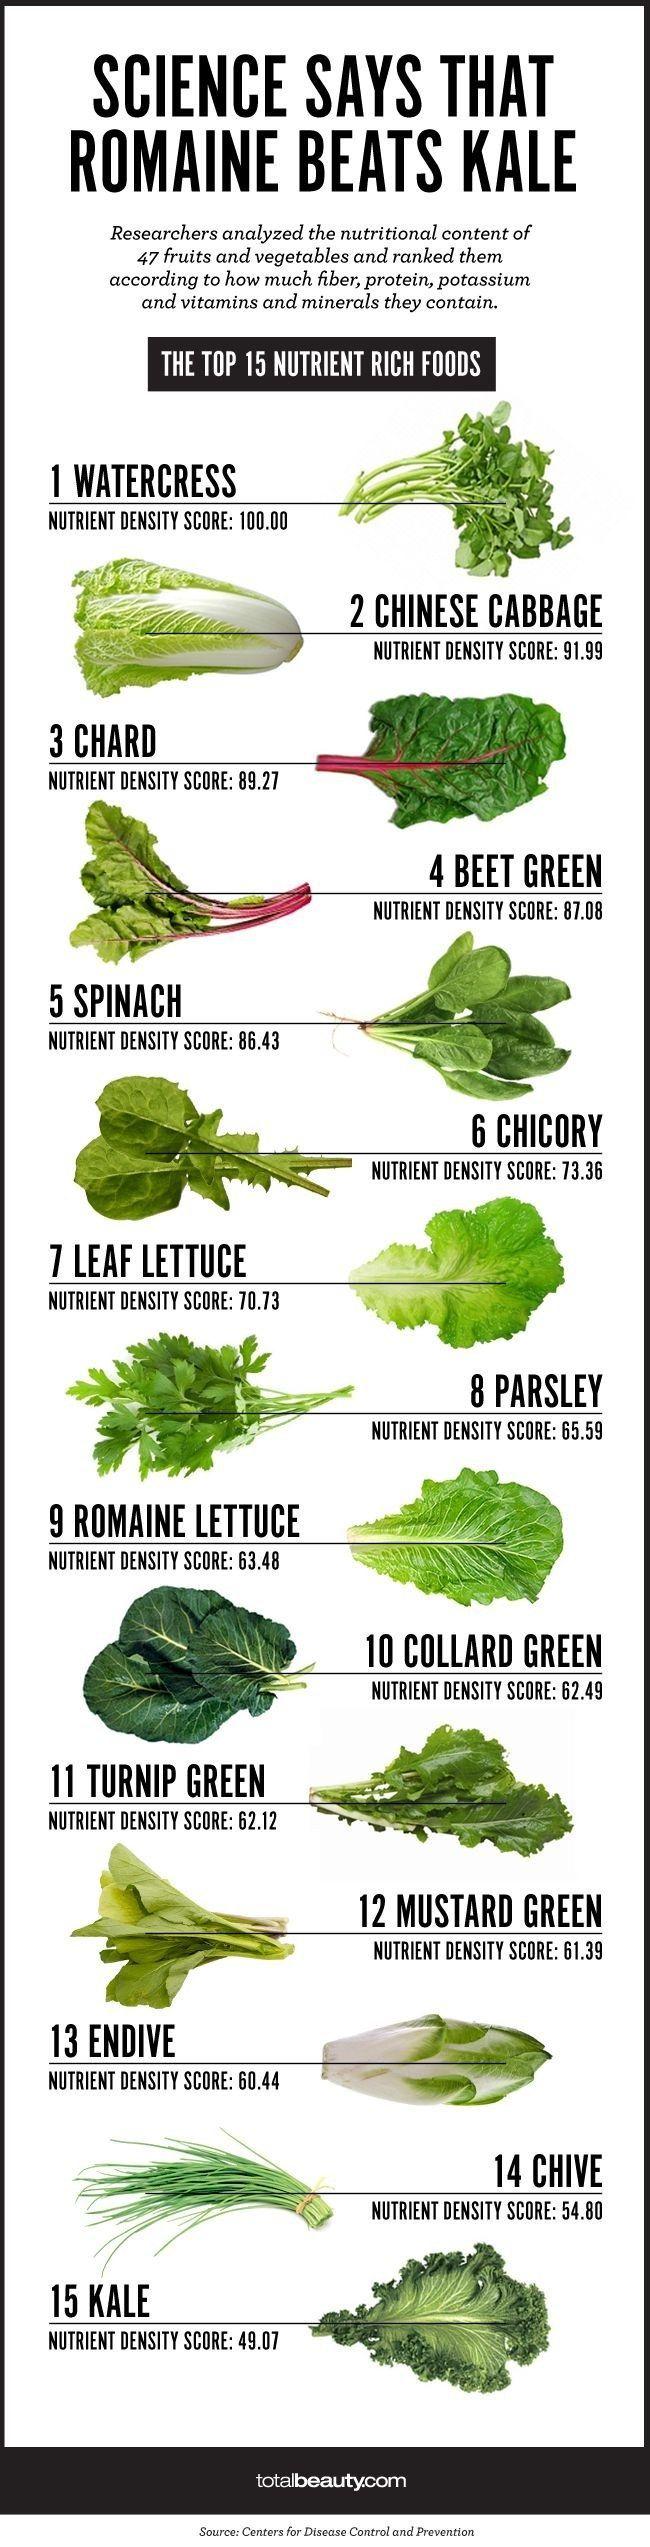 For choosing the best veggies.